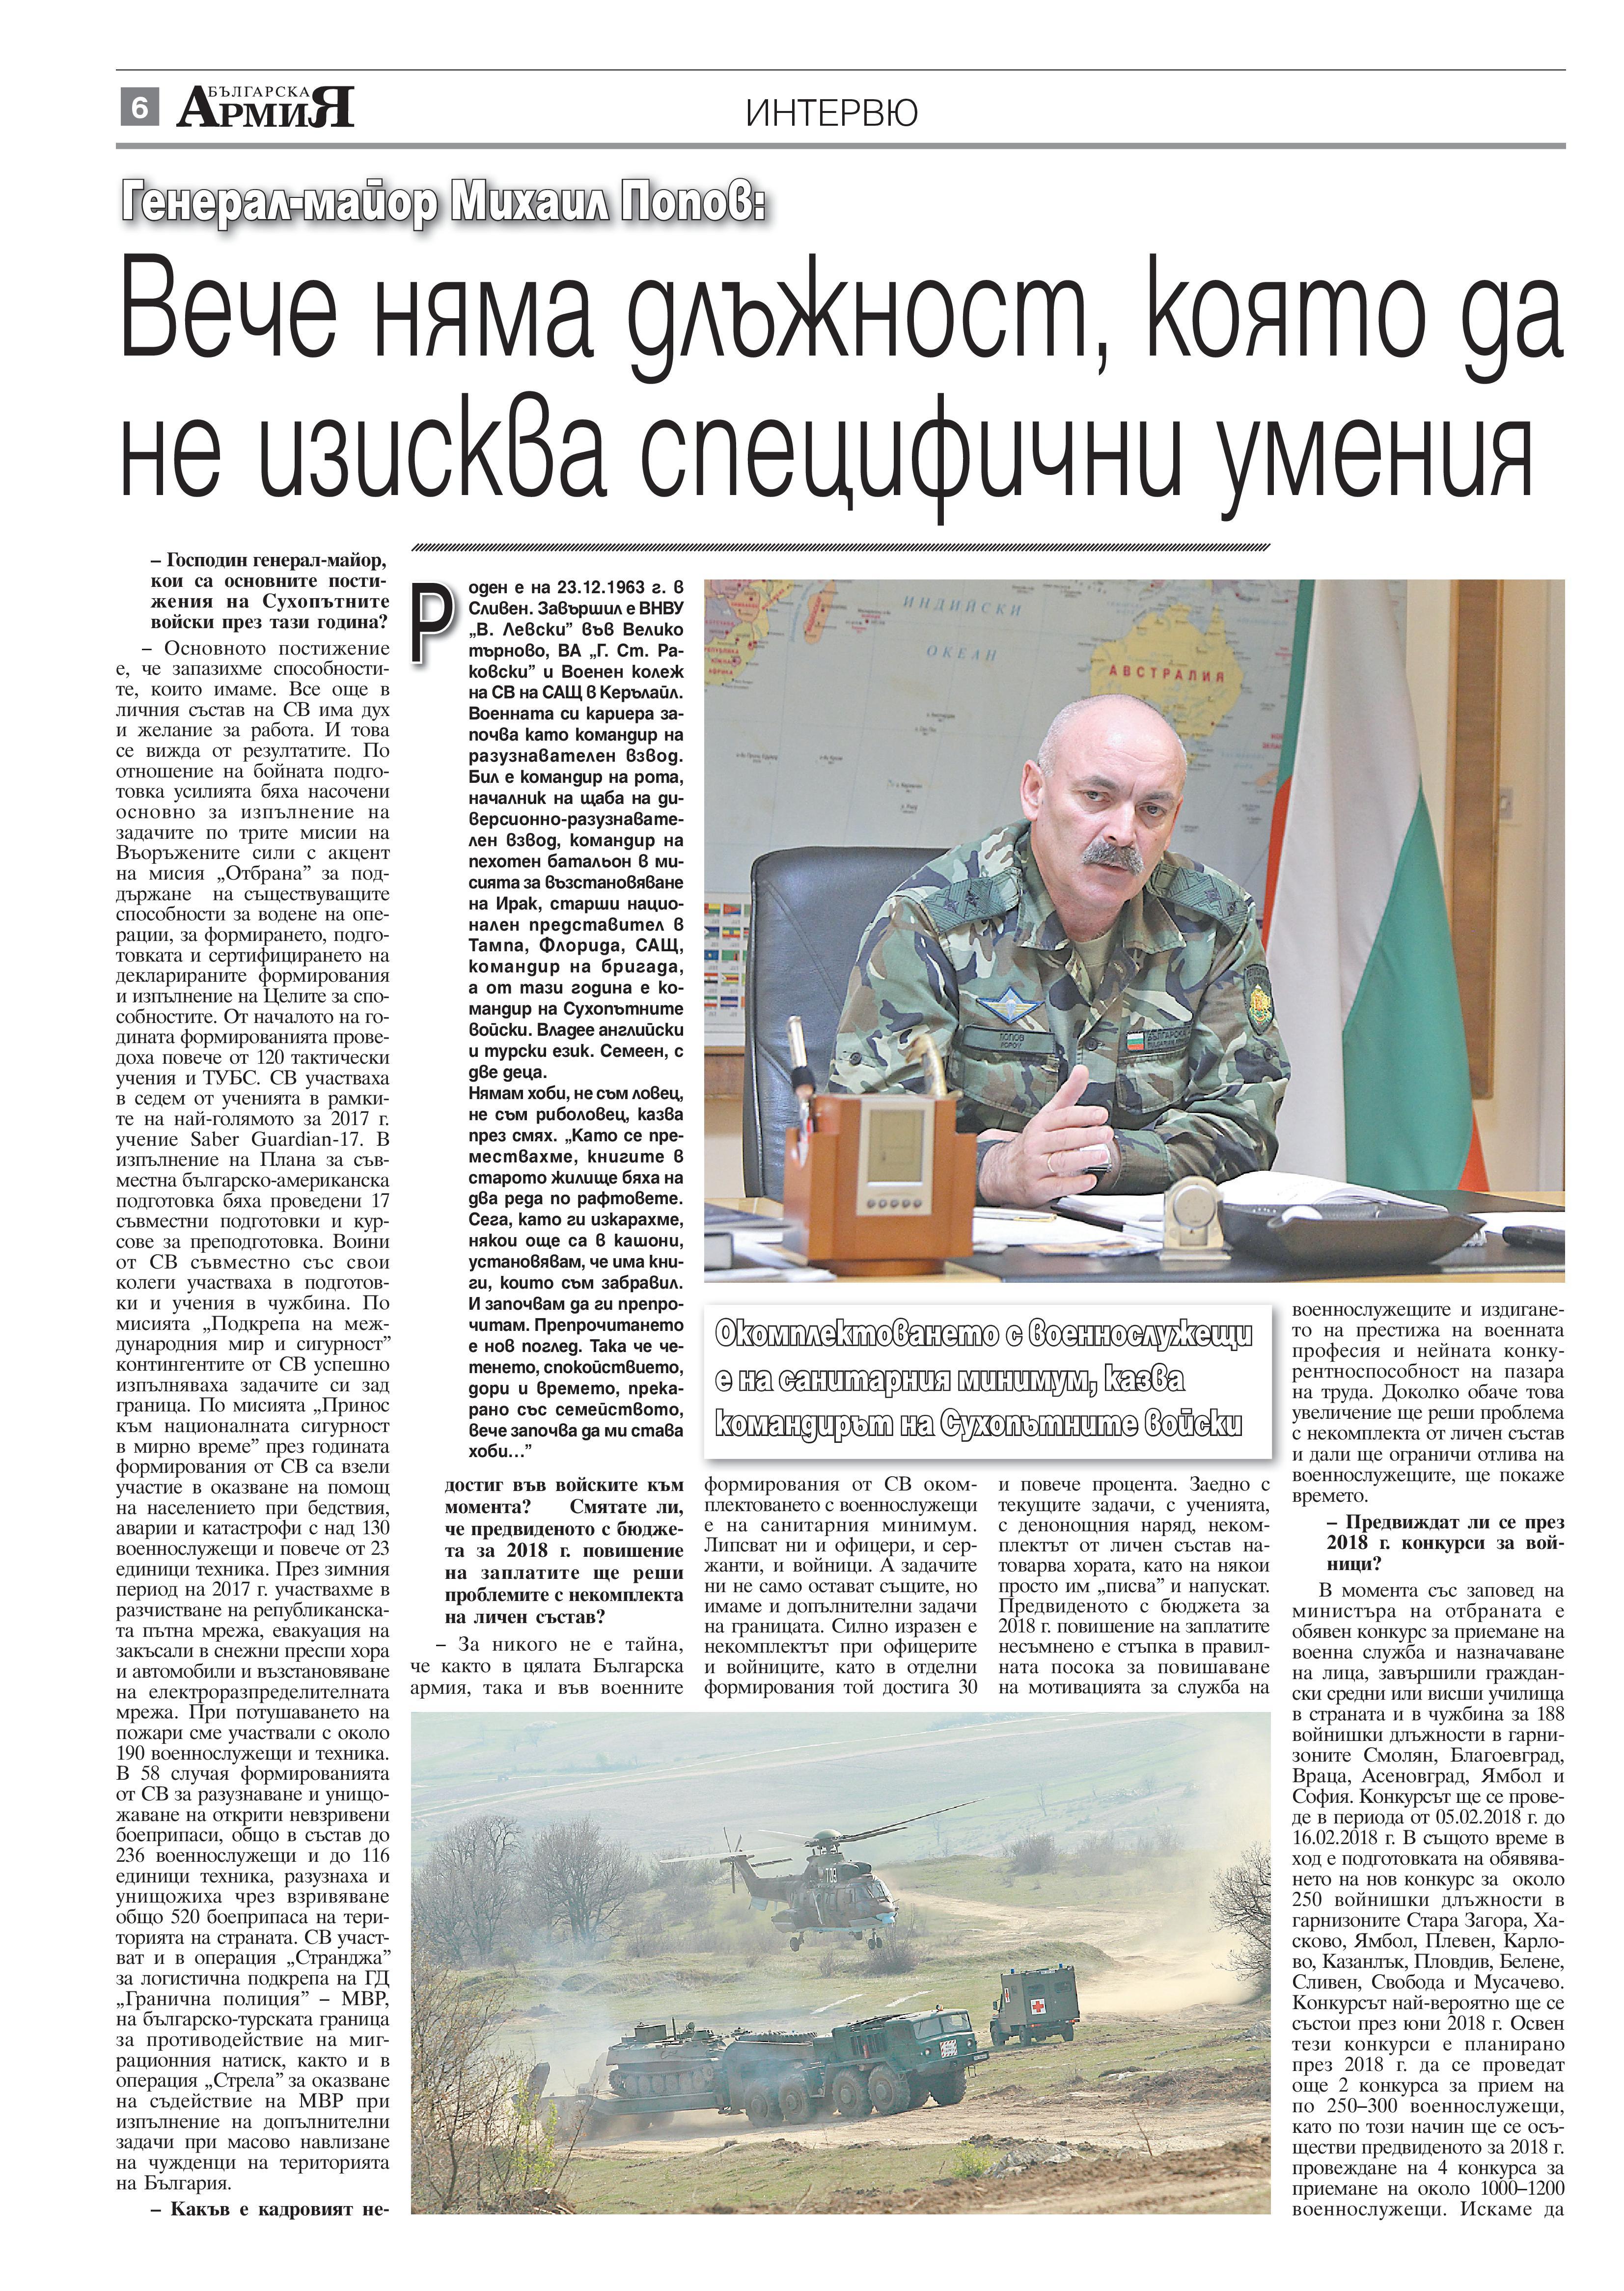 http://armymedia.bg/wp-content/uploads/2015/06/06-11.jpg